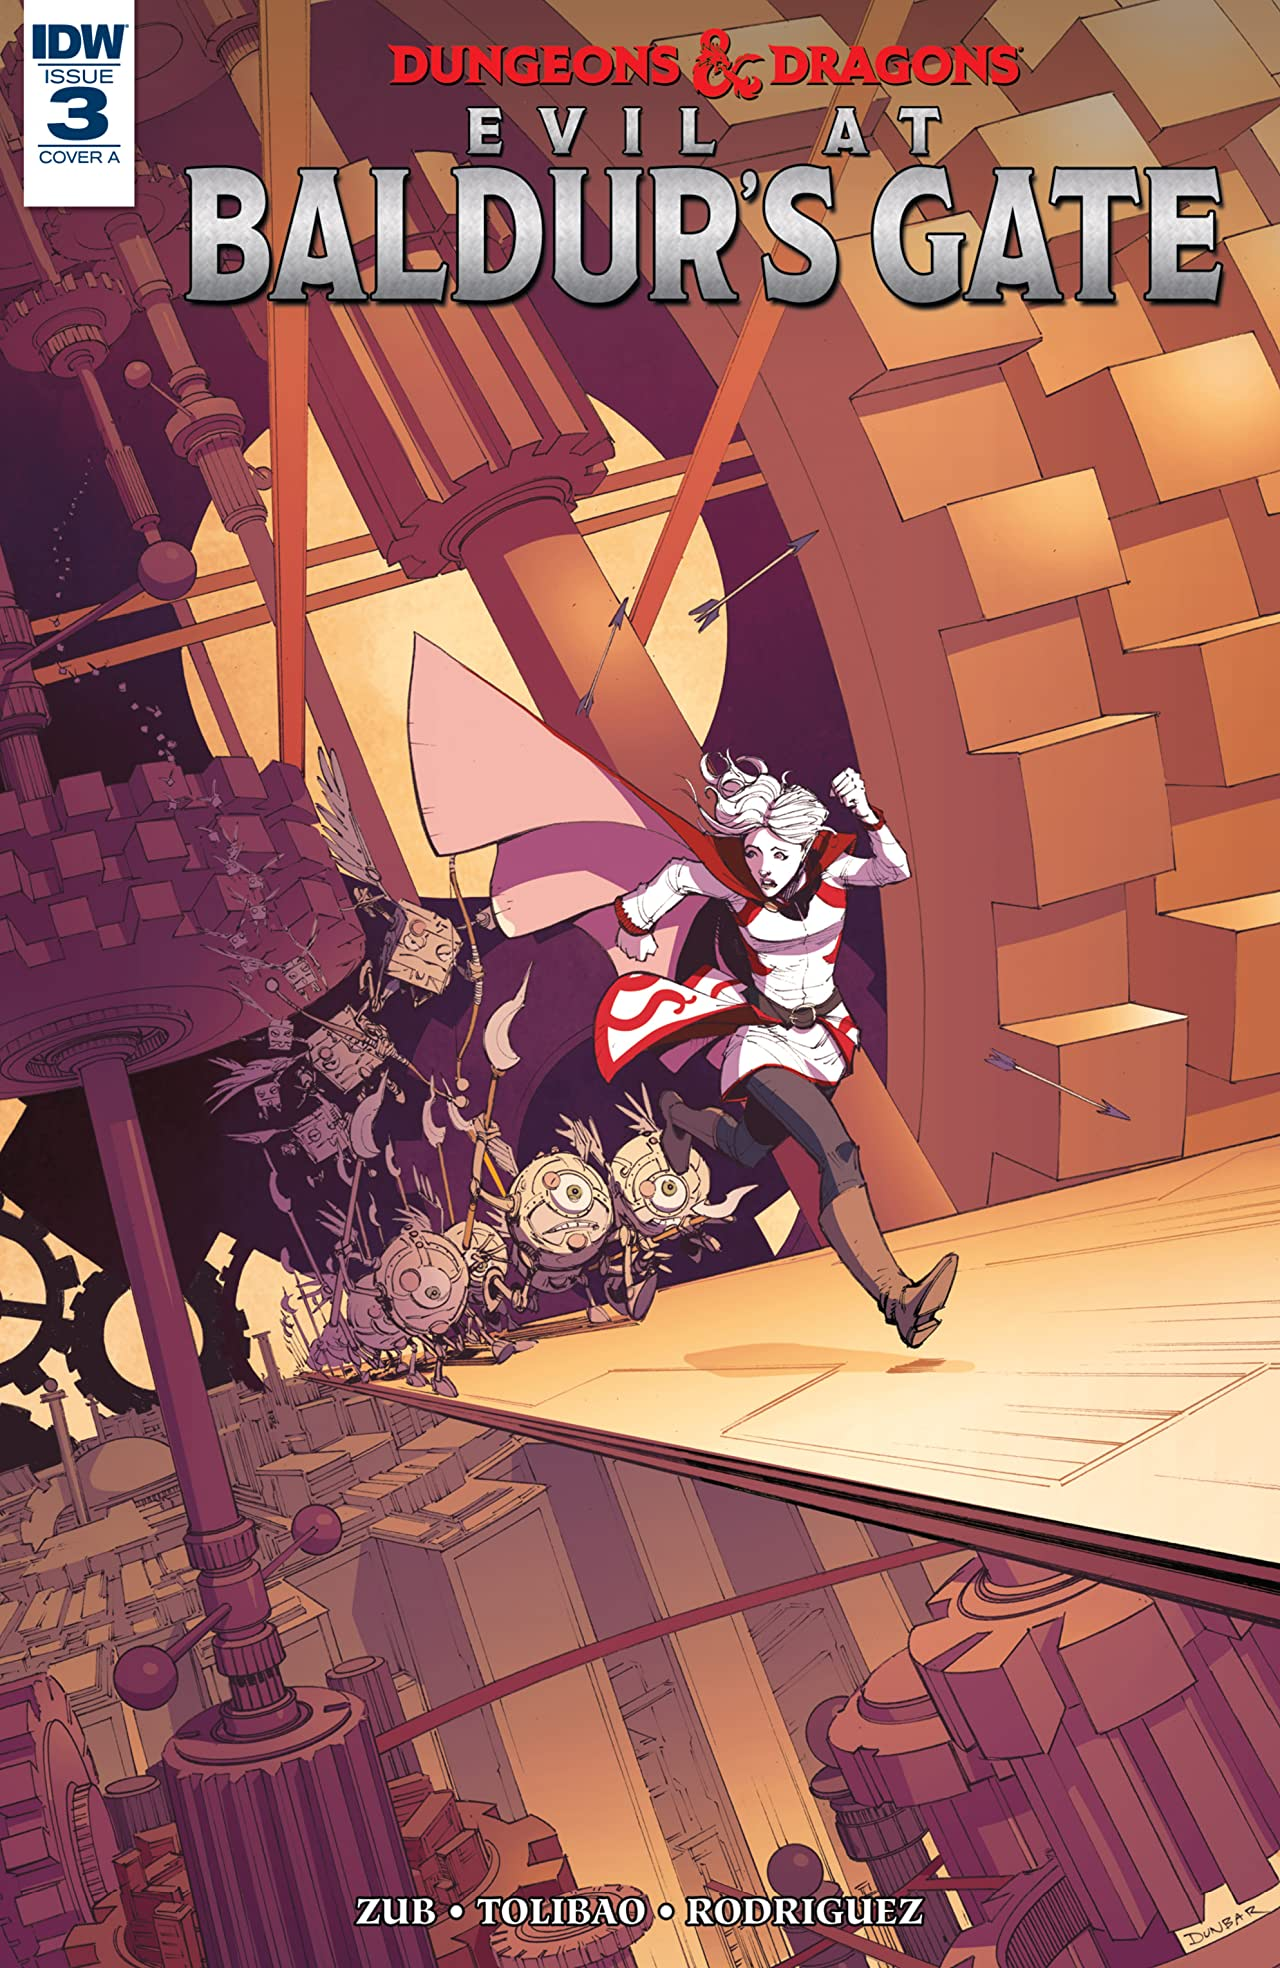 Dungeons & Dragons: Evil at Baldur's Gate #3